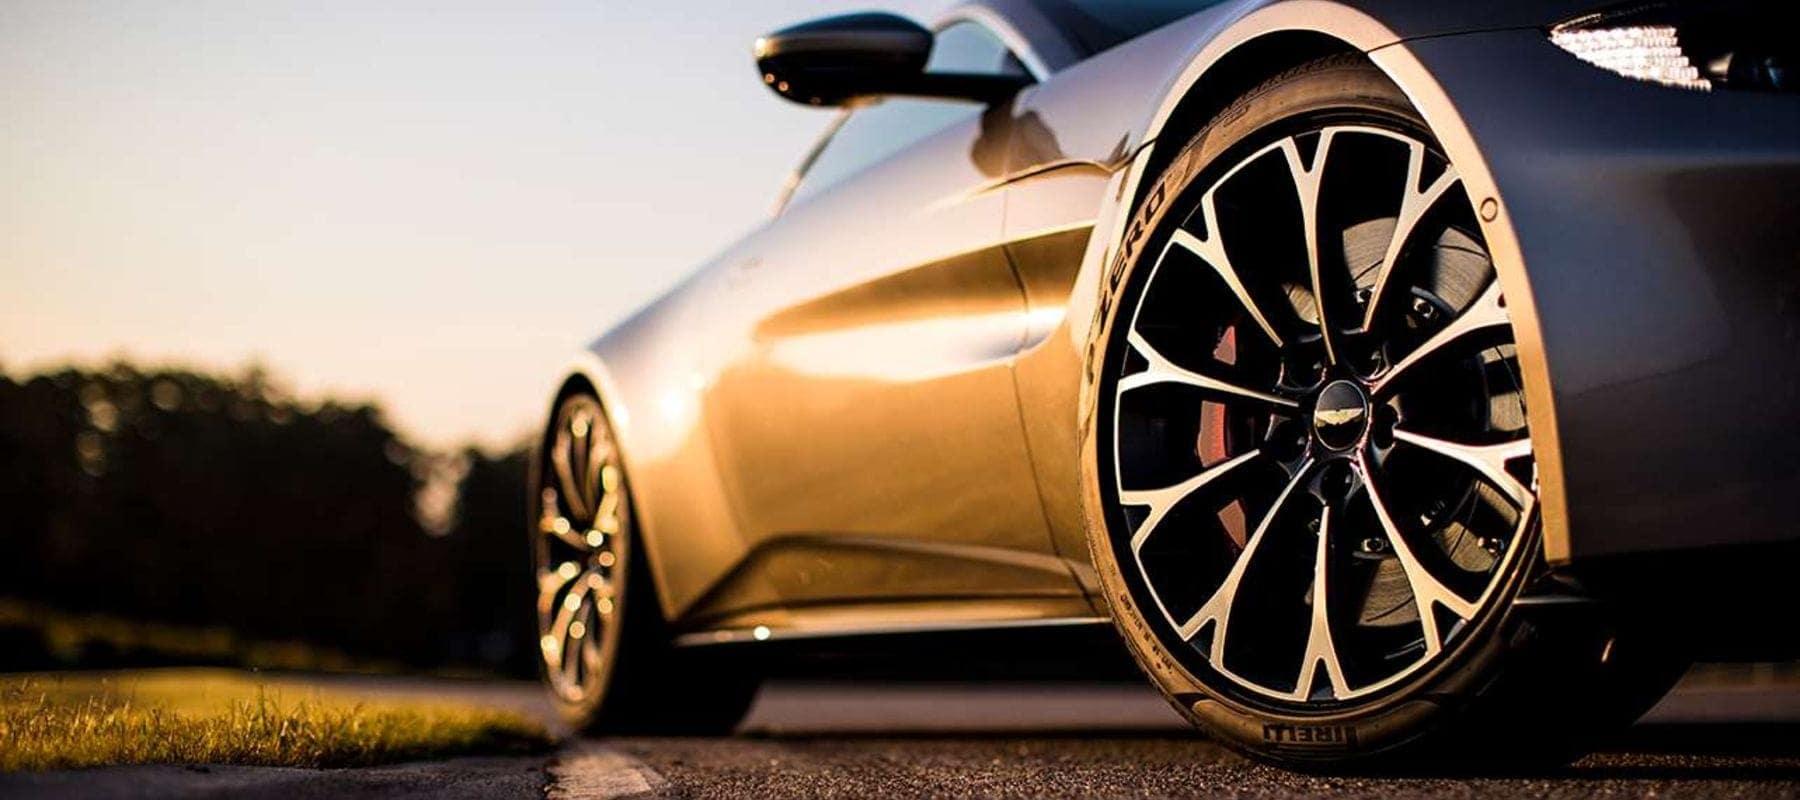 2019 Aston Martin Vantage pic_012